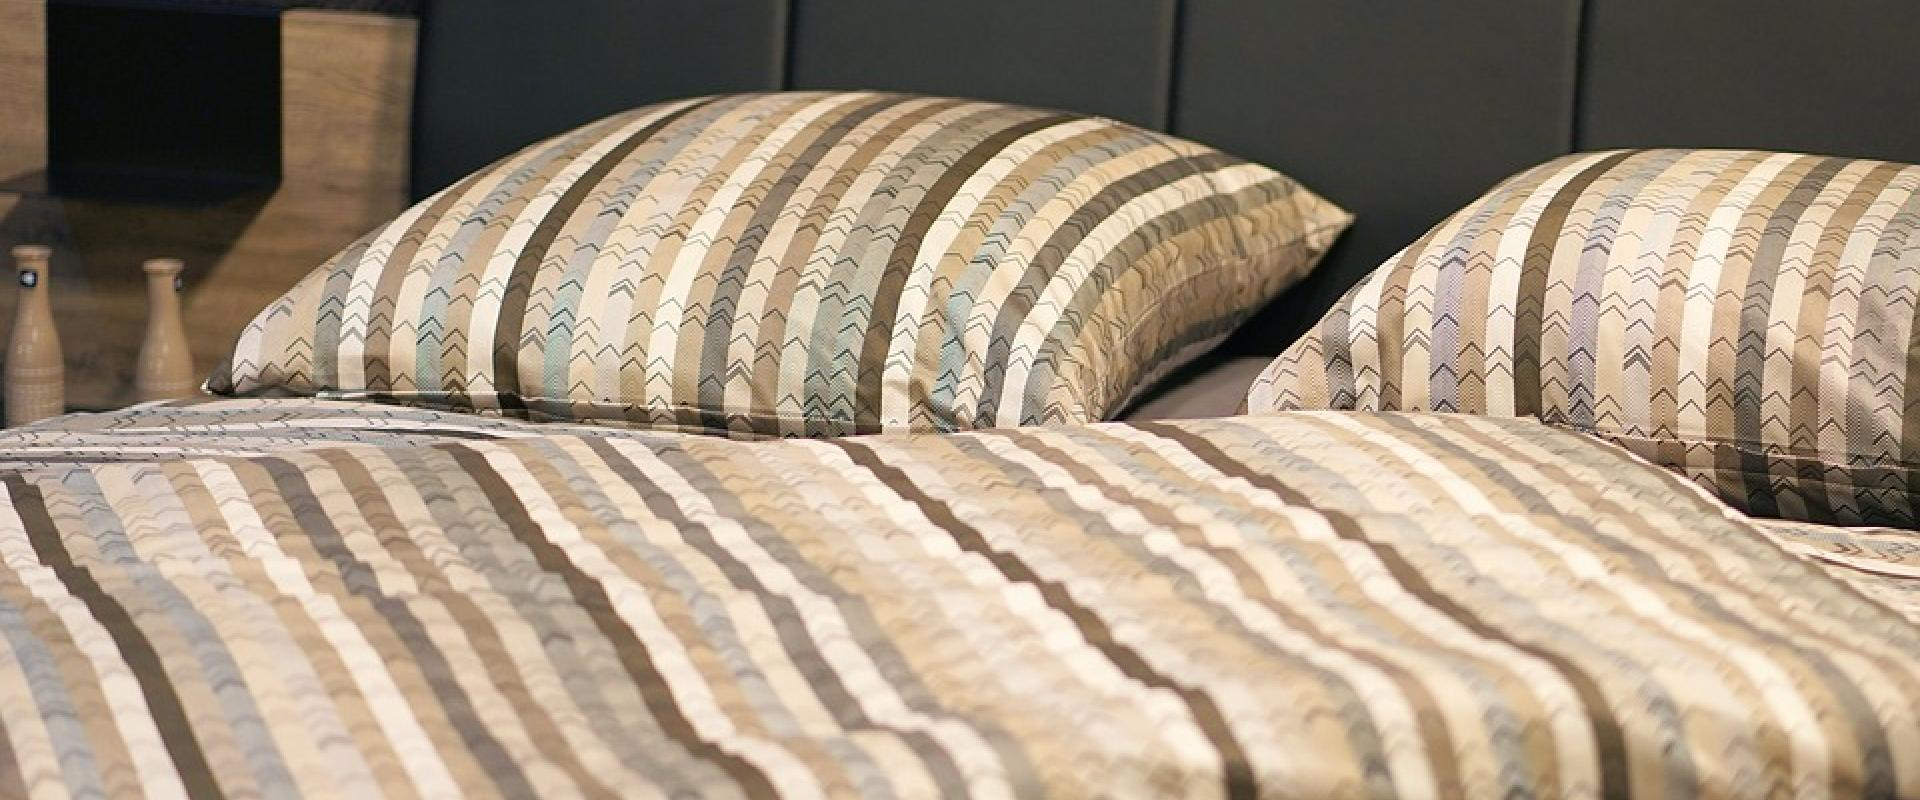 Dónde dormir - Alto Porma